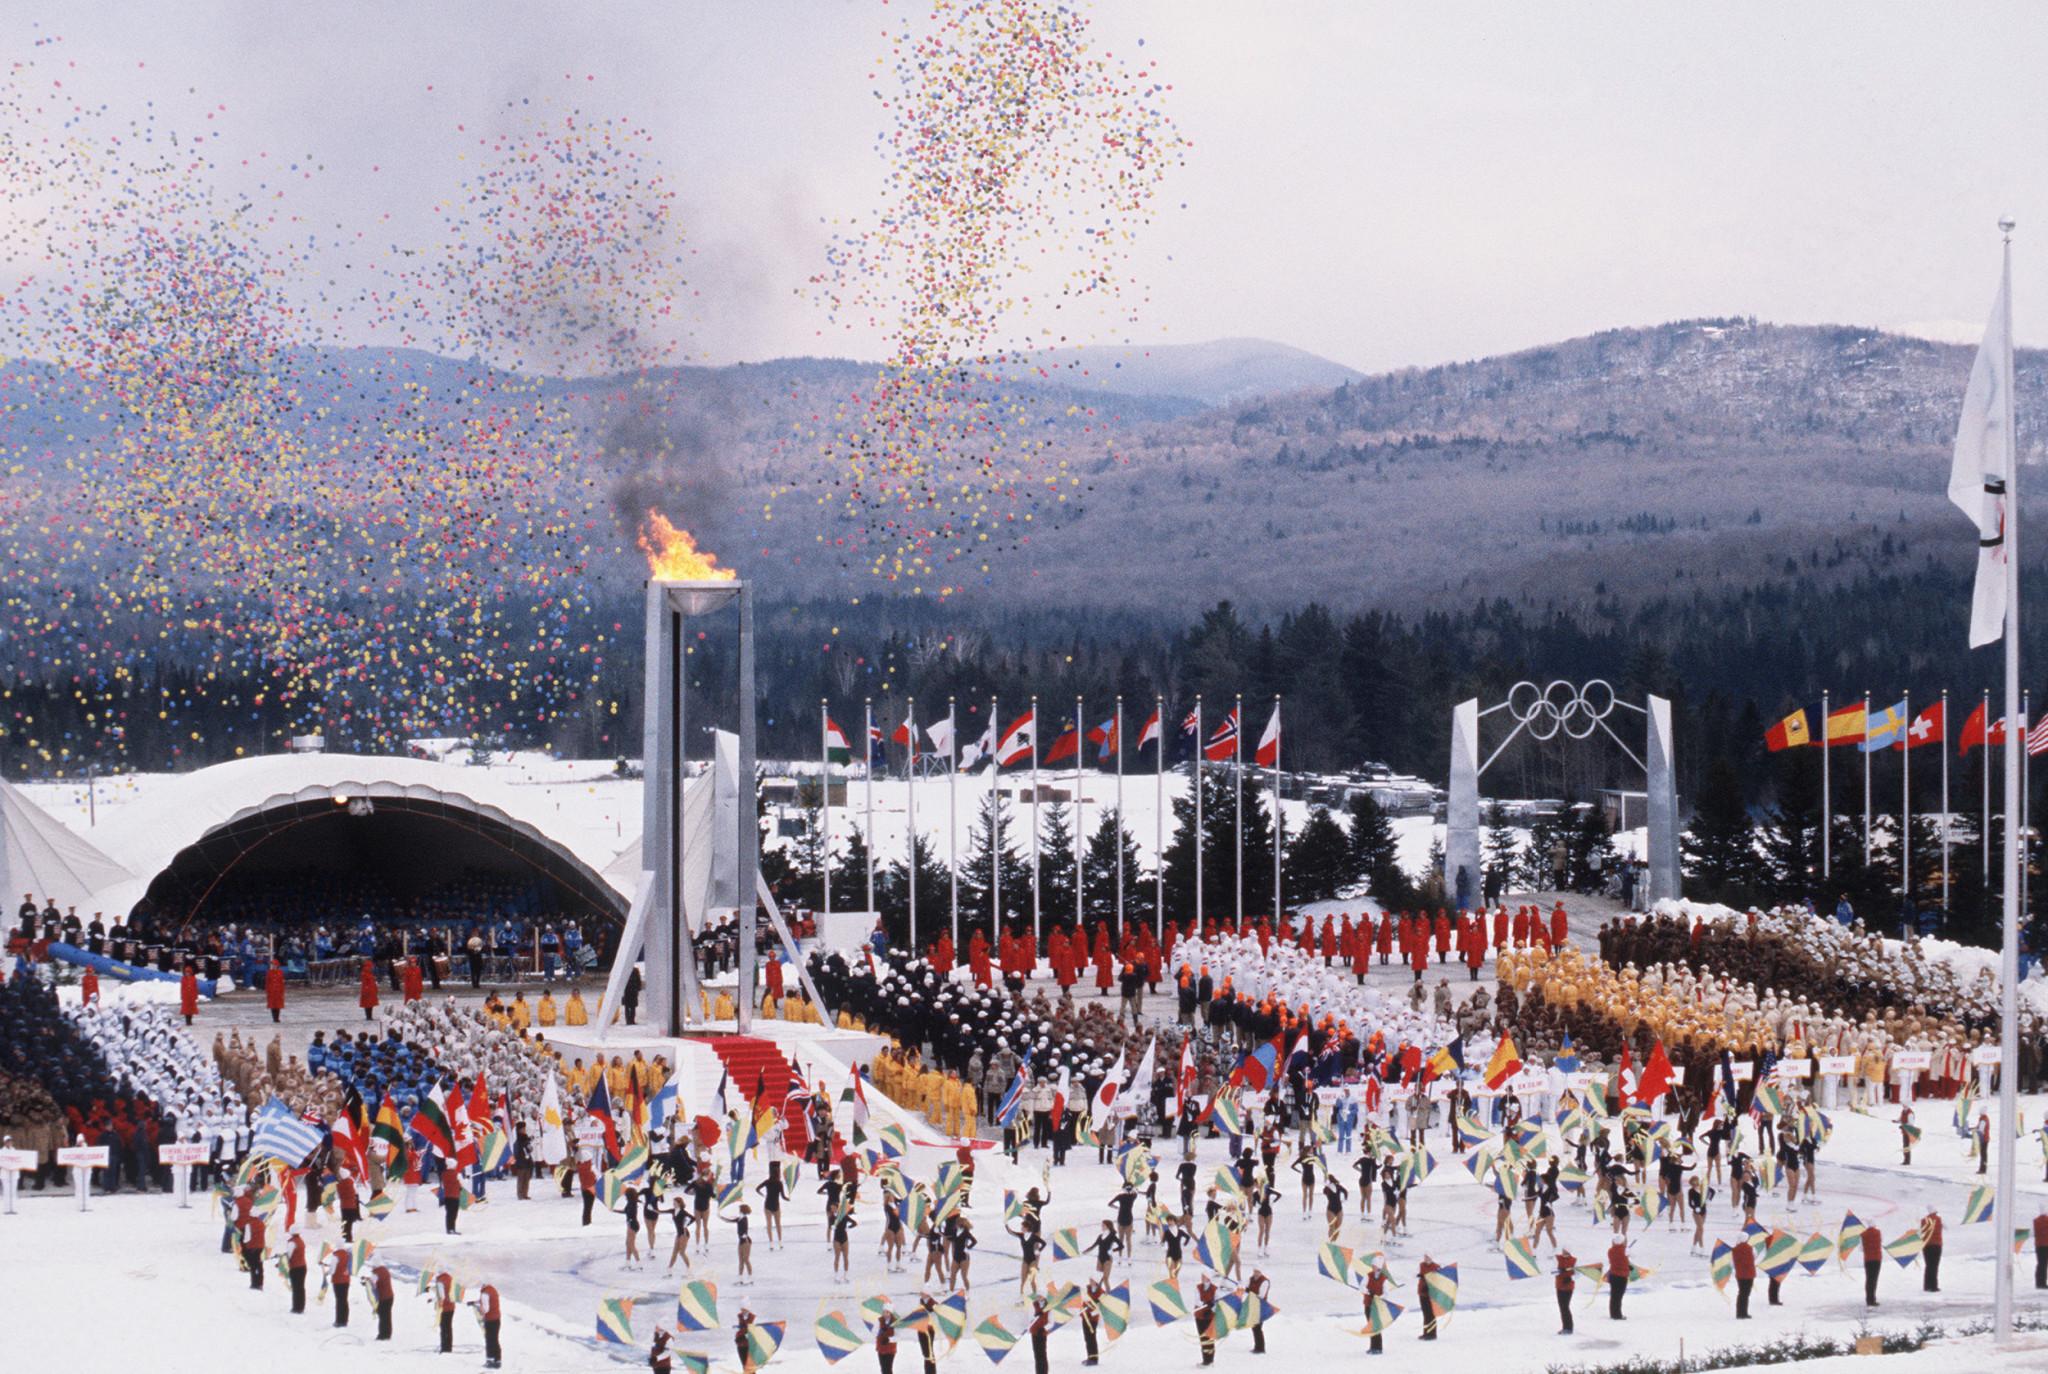 Lake Placid 2023 Winter Universiade bid handed funding boost